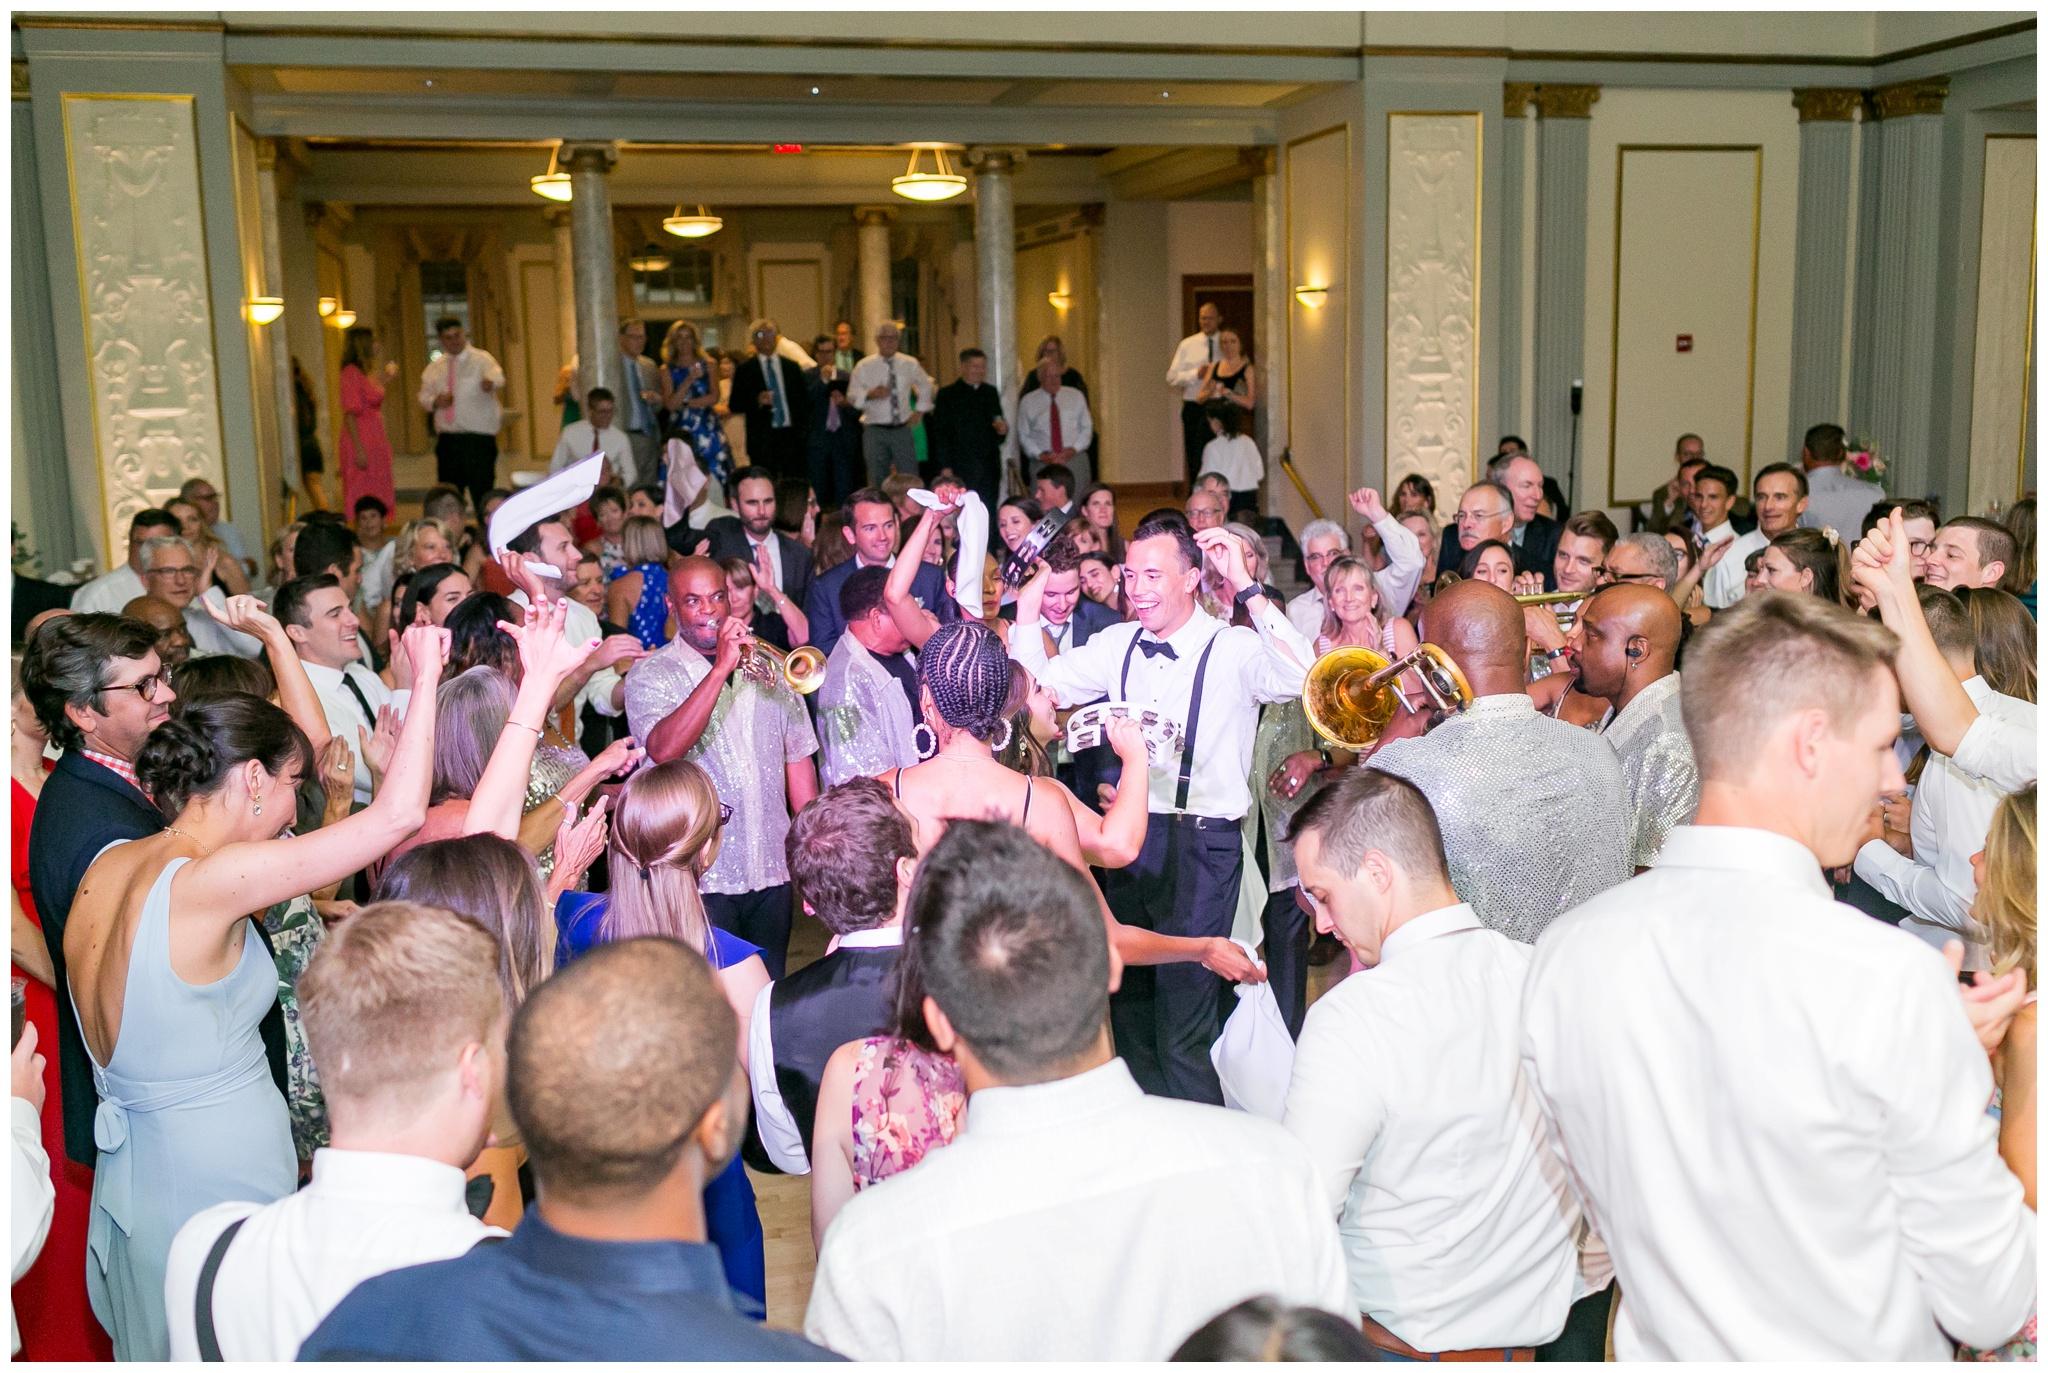 UW_Memorial_Union_wedding_madison_wisconsin_wedding_photographers_4654.jpg